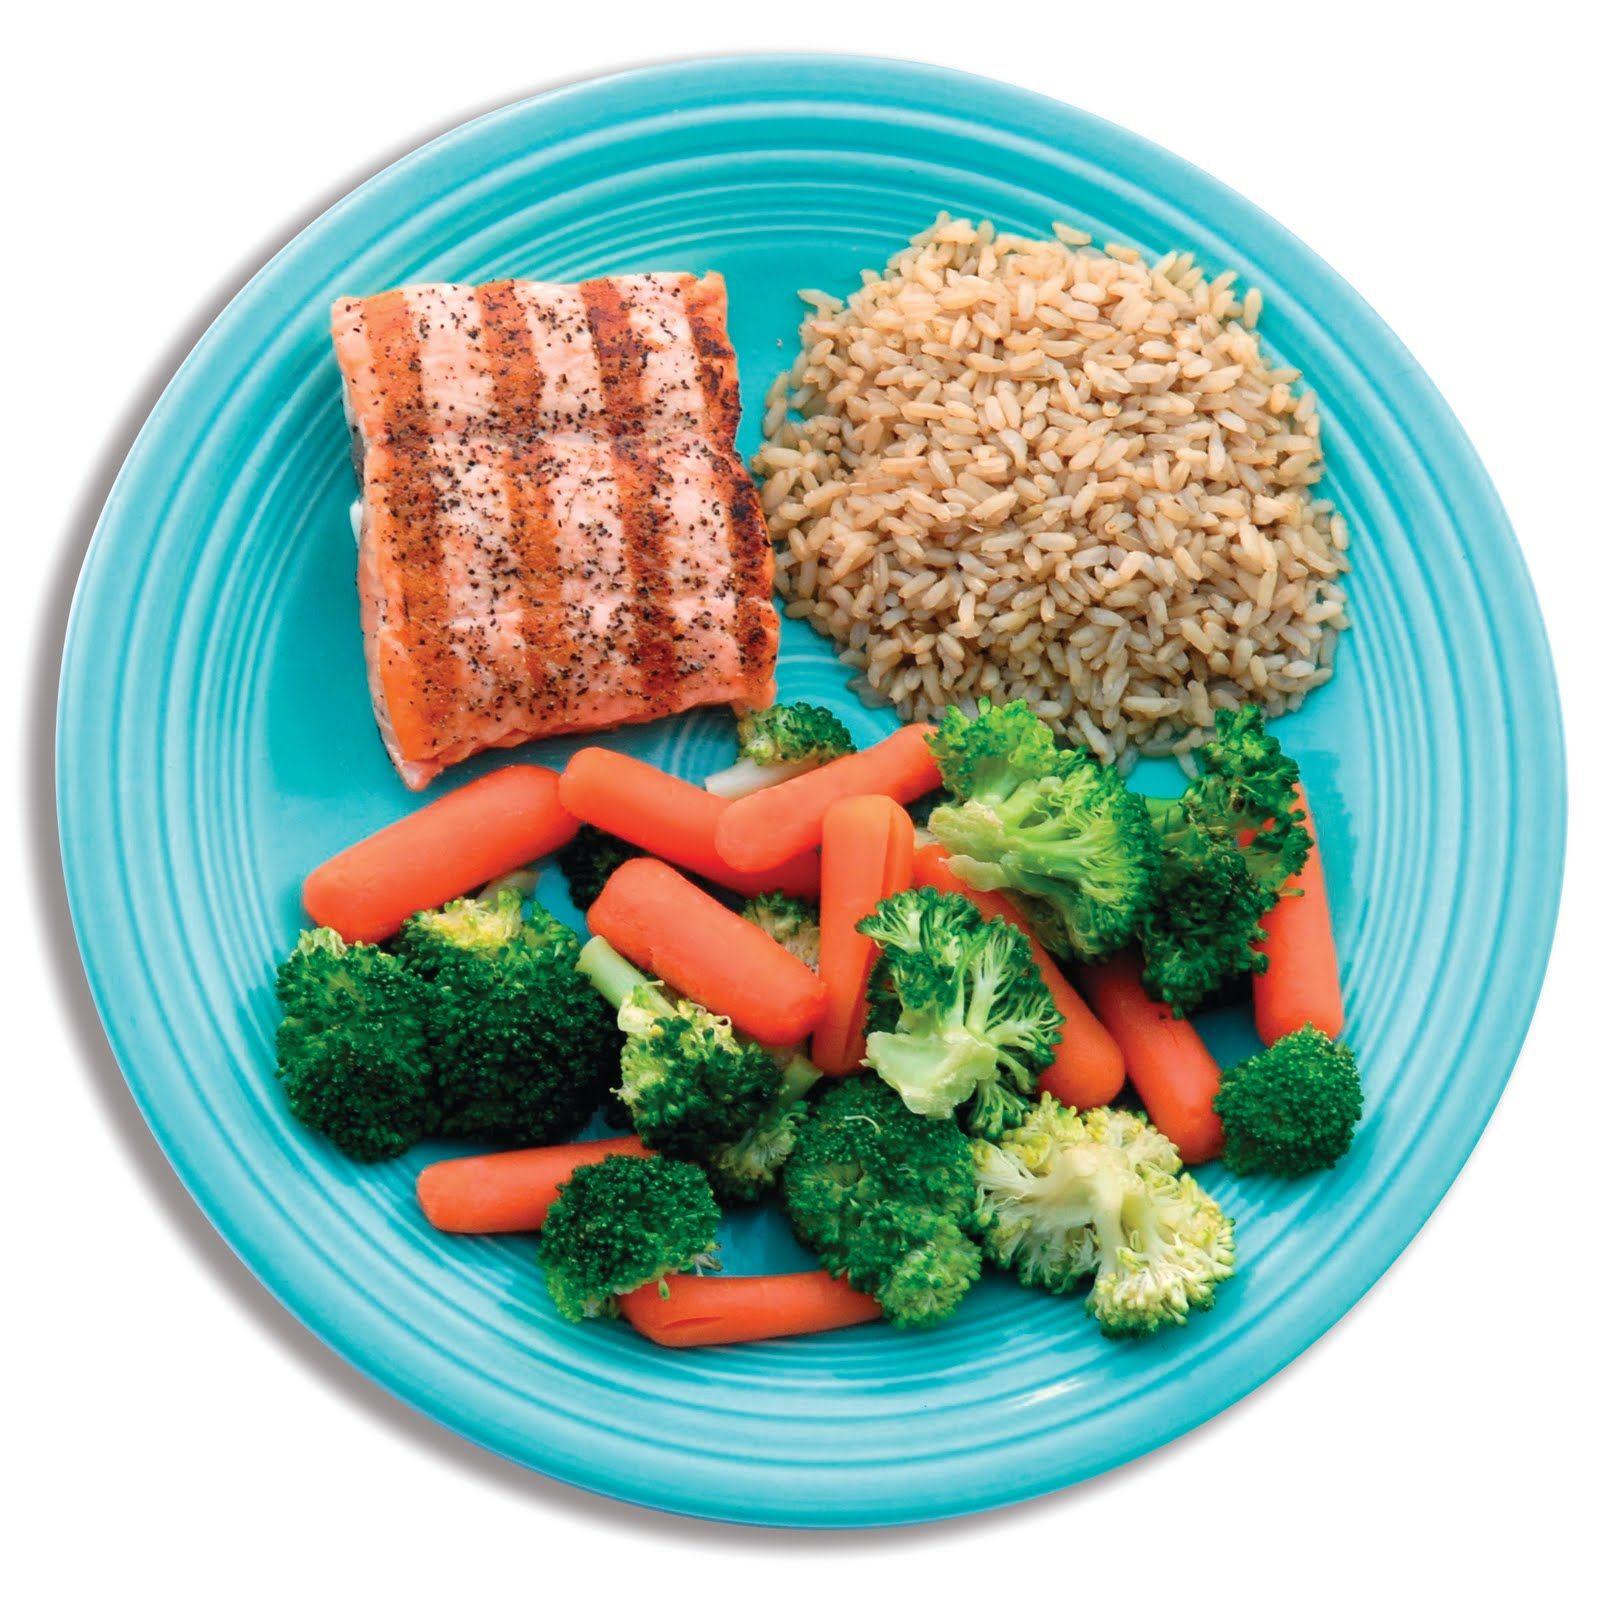 Healthy Food Plate Model Invitation Templates Healthy Food Plate Healthy Recipes Super Healthy Recipes